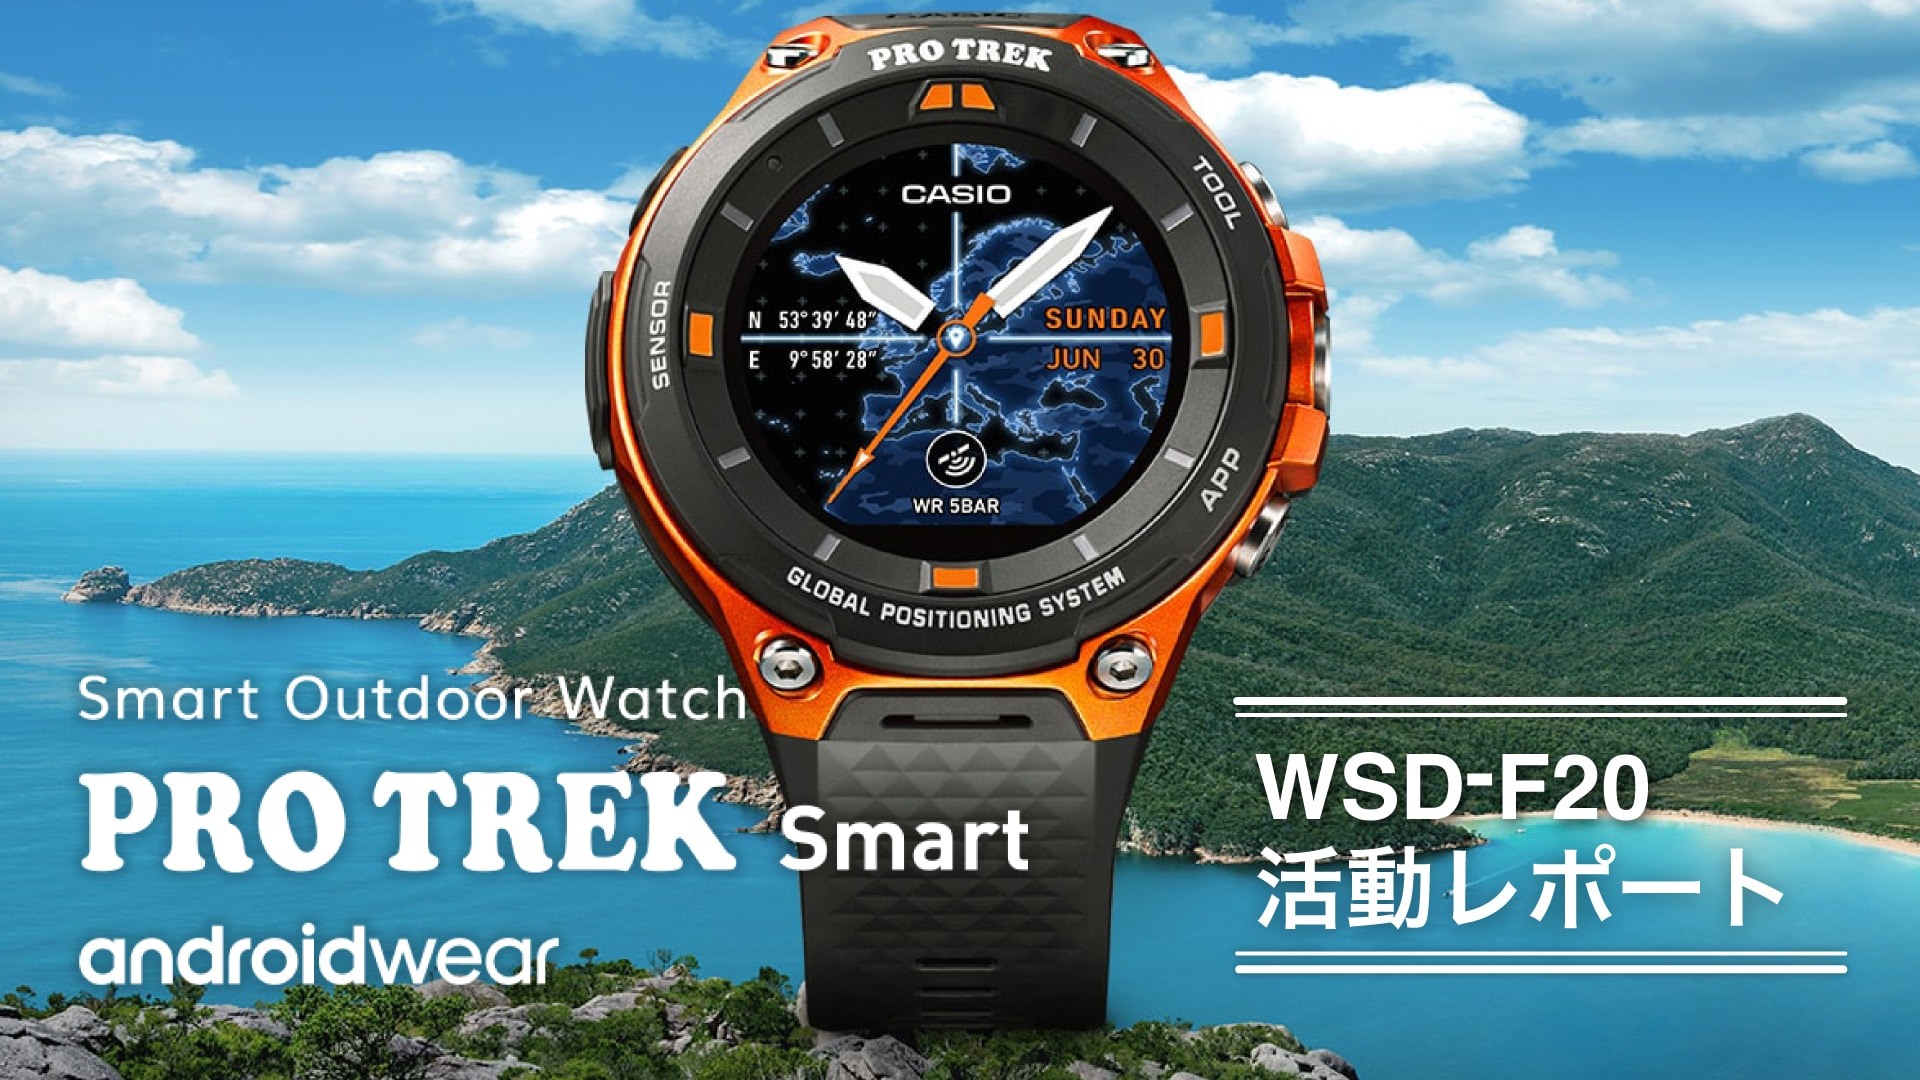 PRO TREK Smart WSD-F20活動レポート